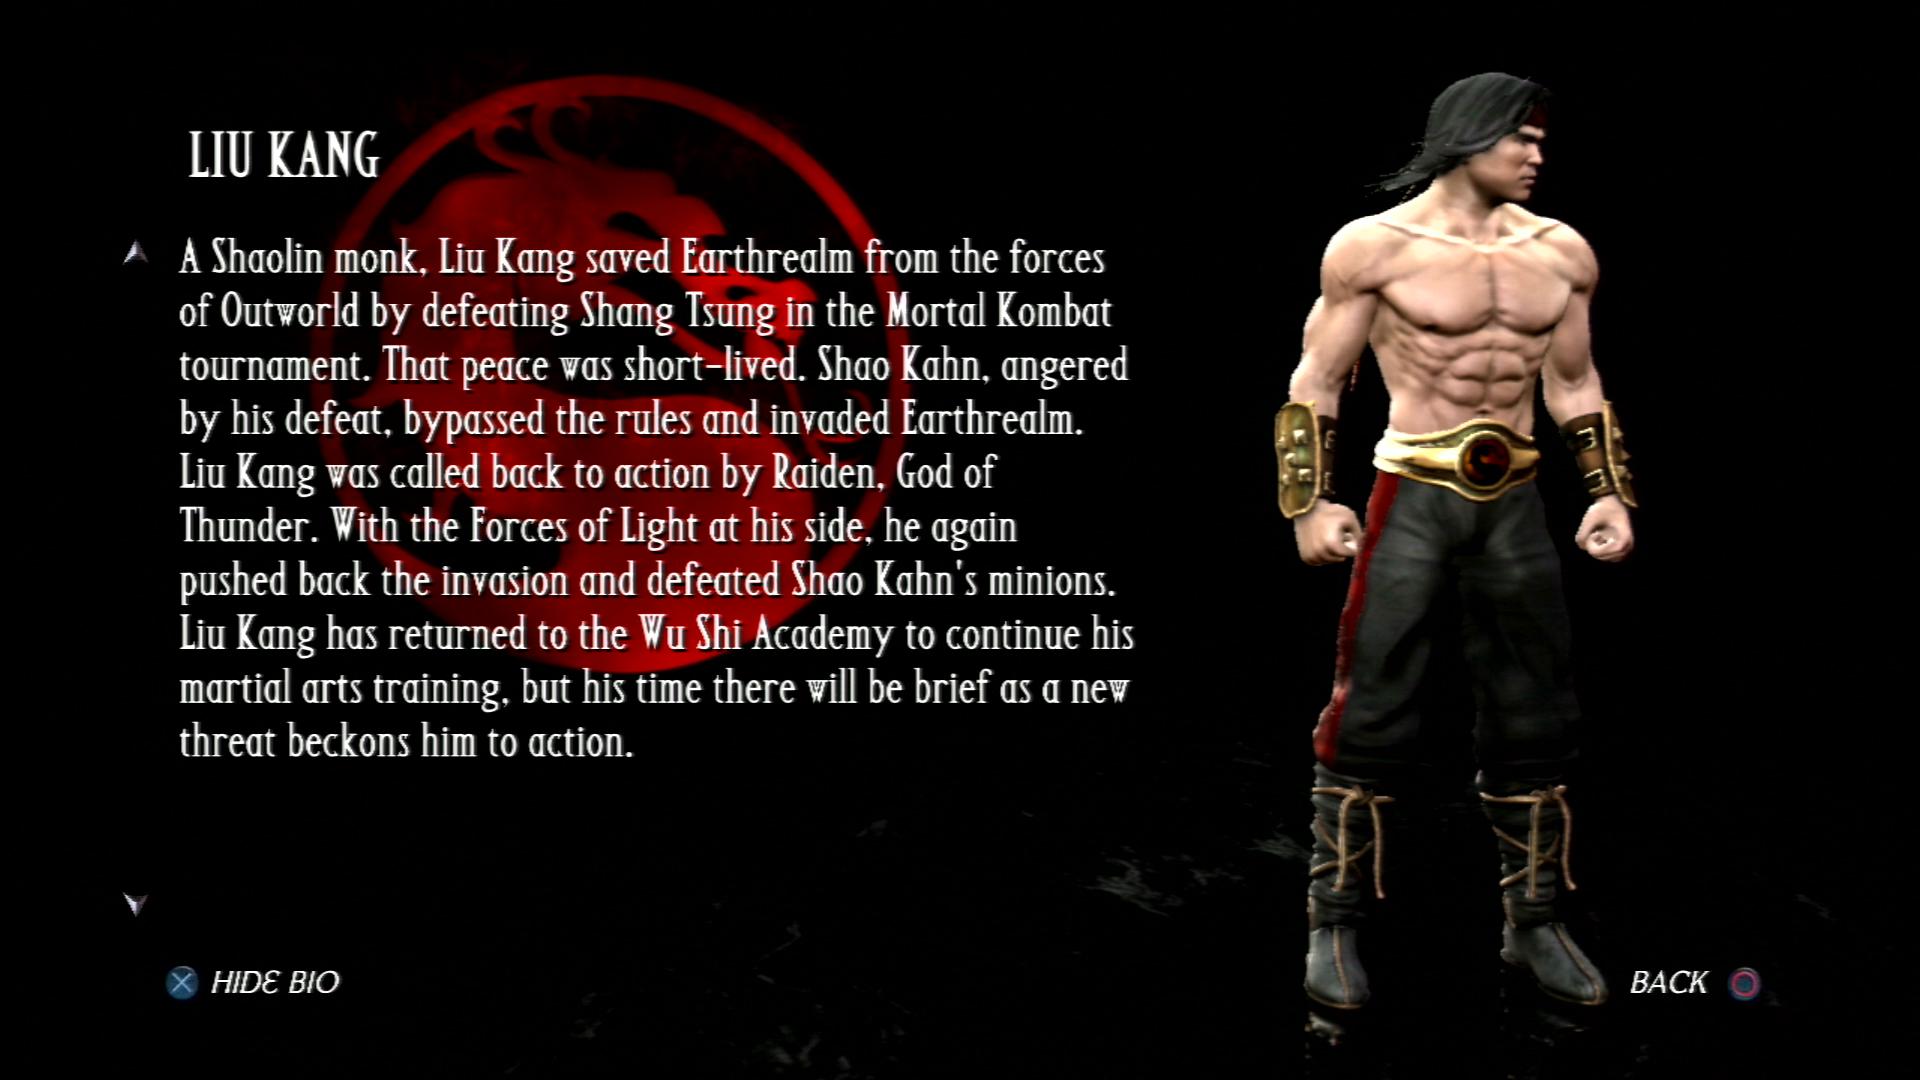 Лю Кан - Mortal Kombat vs. DC Universe Персонаж